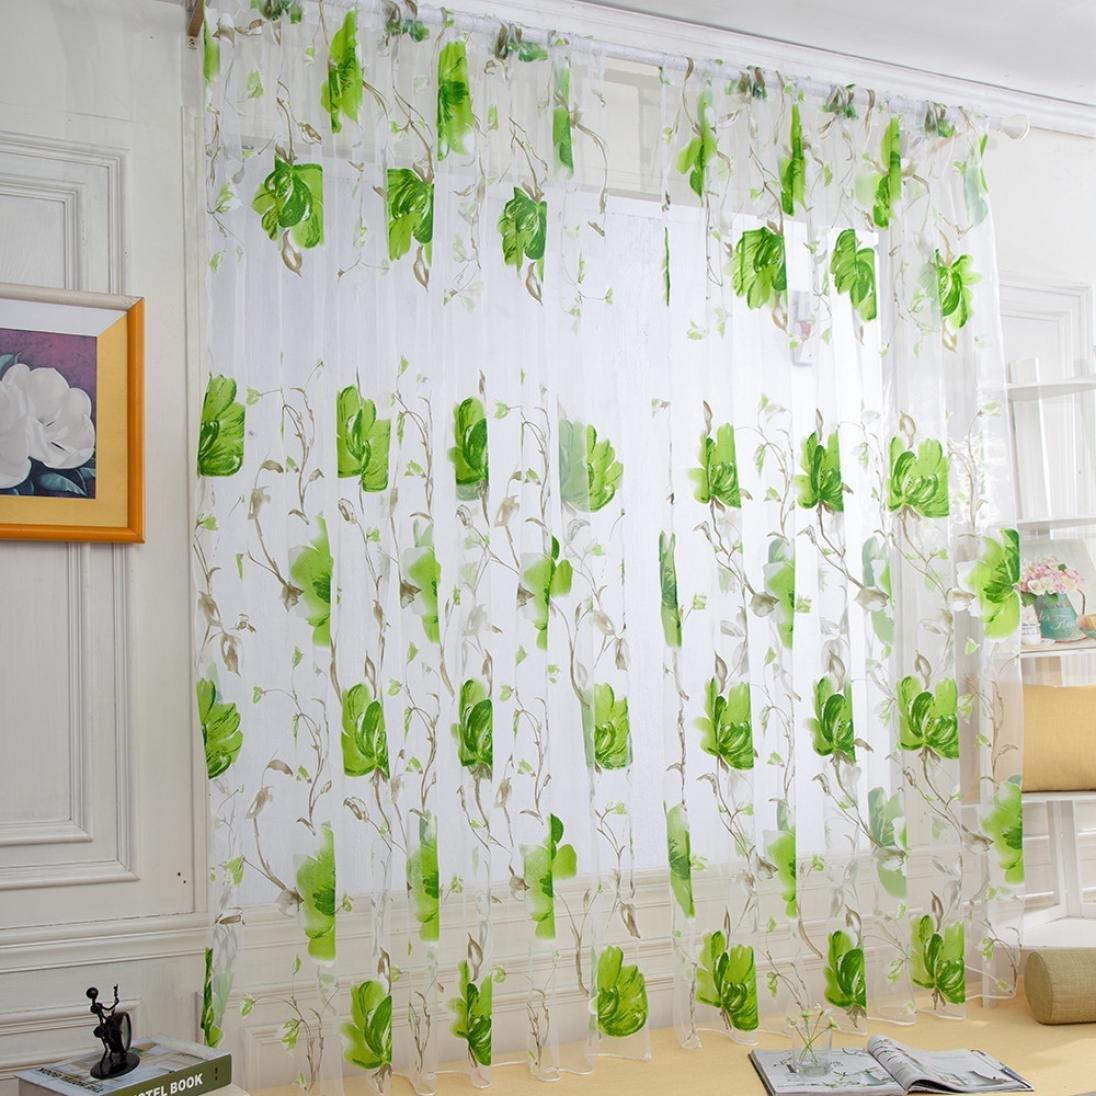 WensLTD Clearance! 1PC Vines Leaves Tulle Door Window Curtain Drape Panel Sheer Scarf Valances (Green)